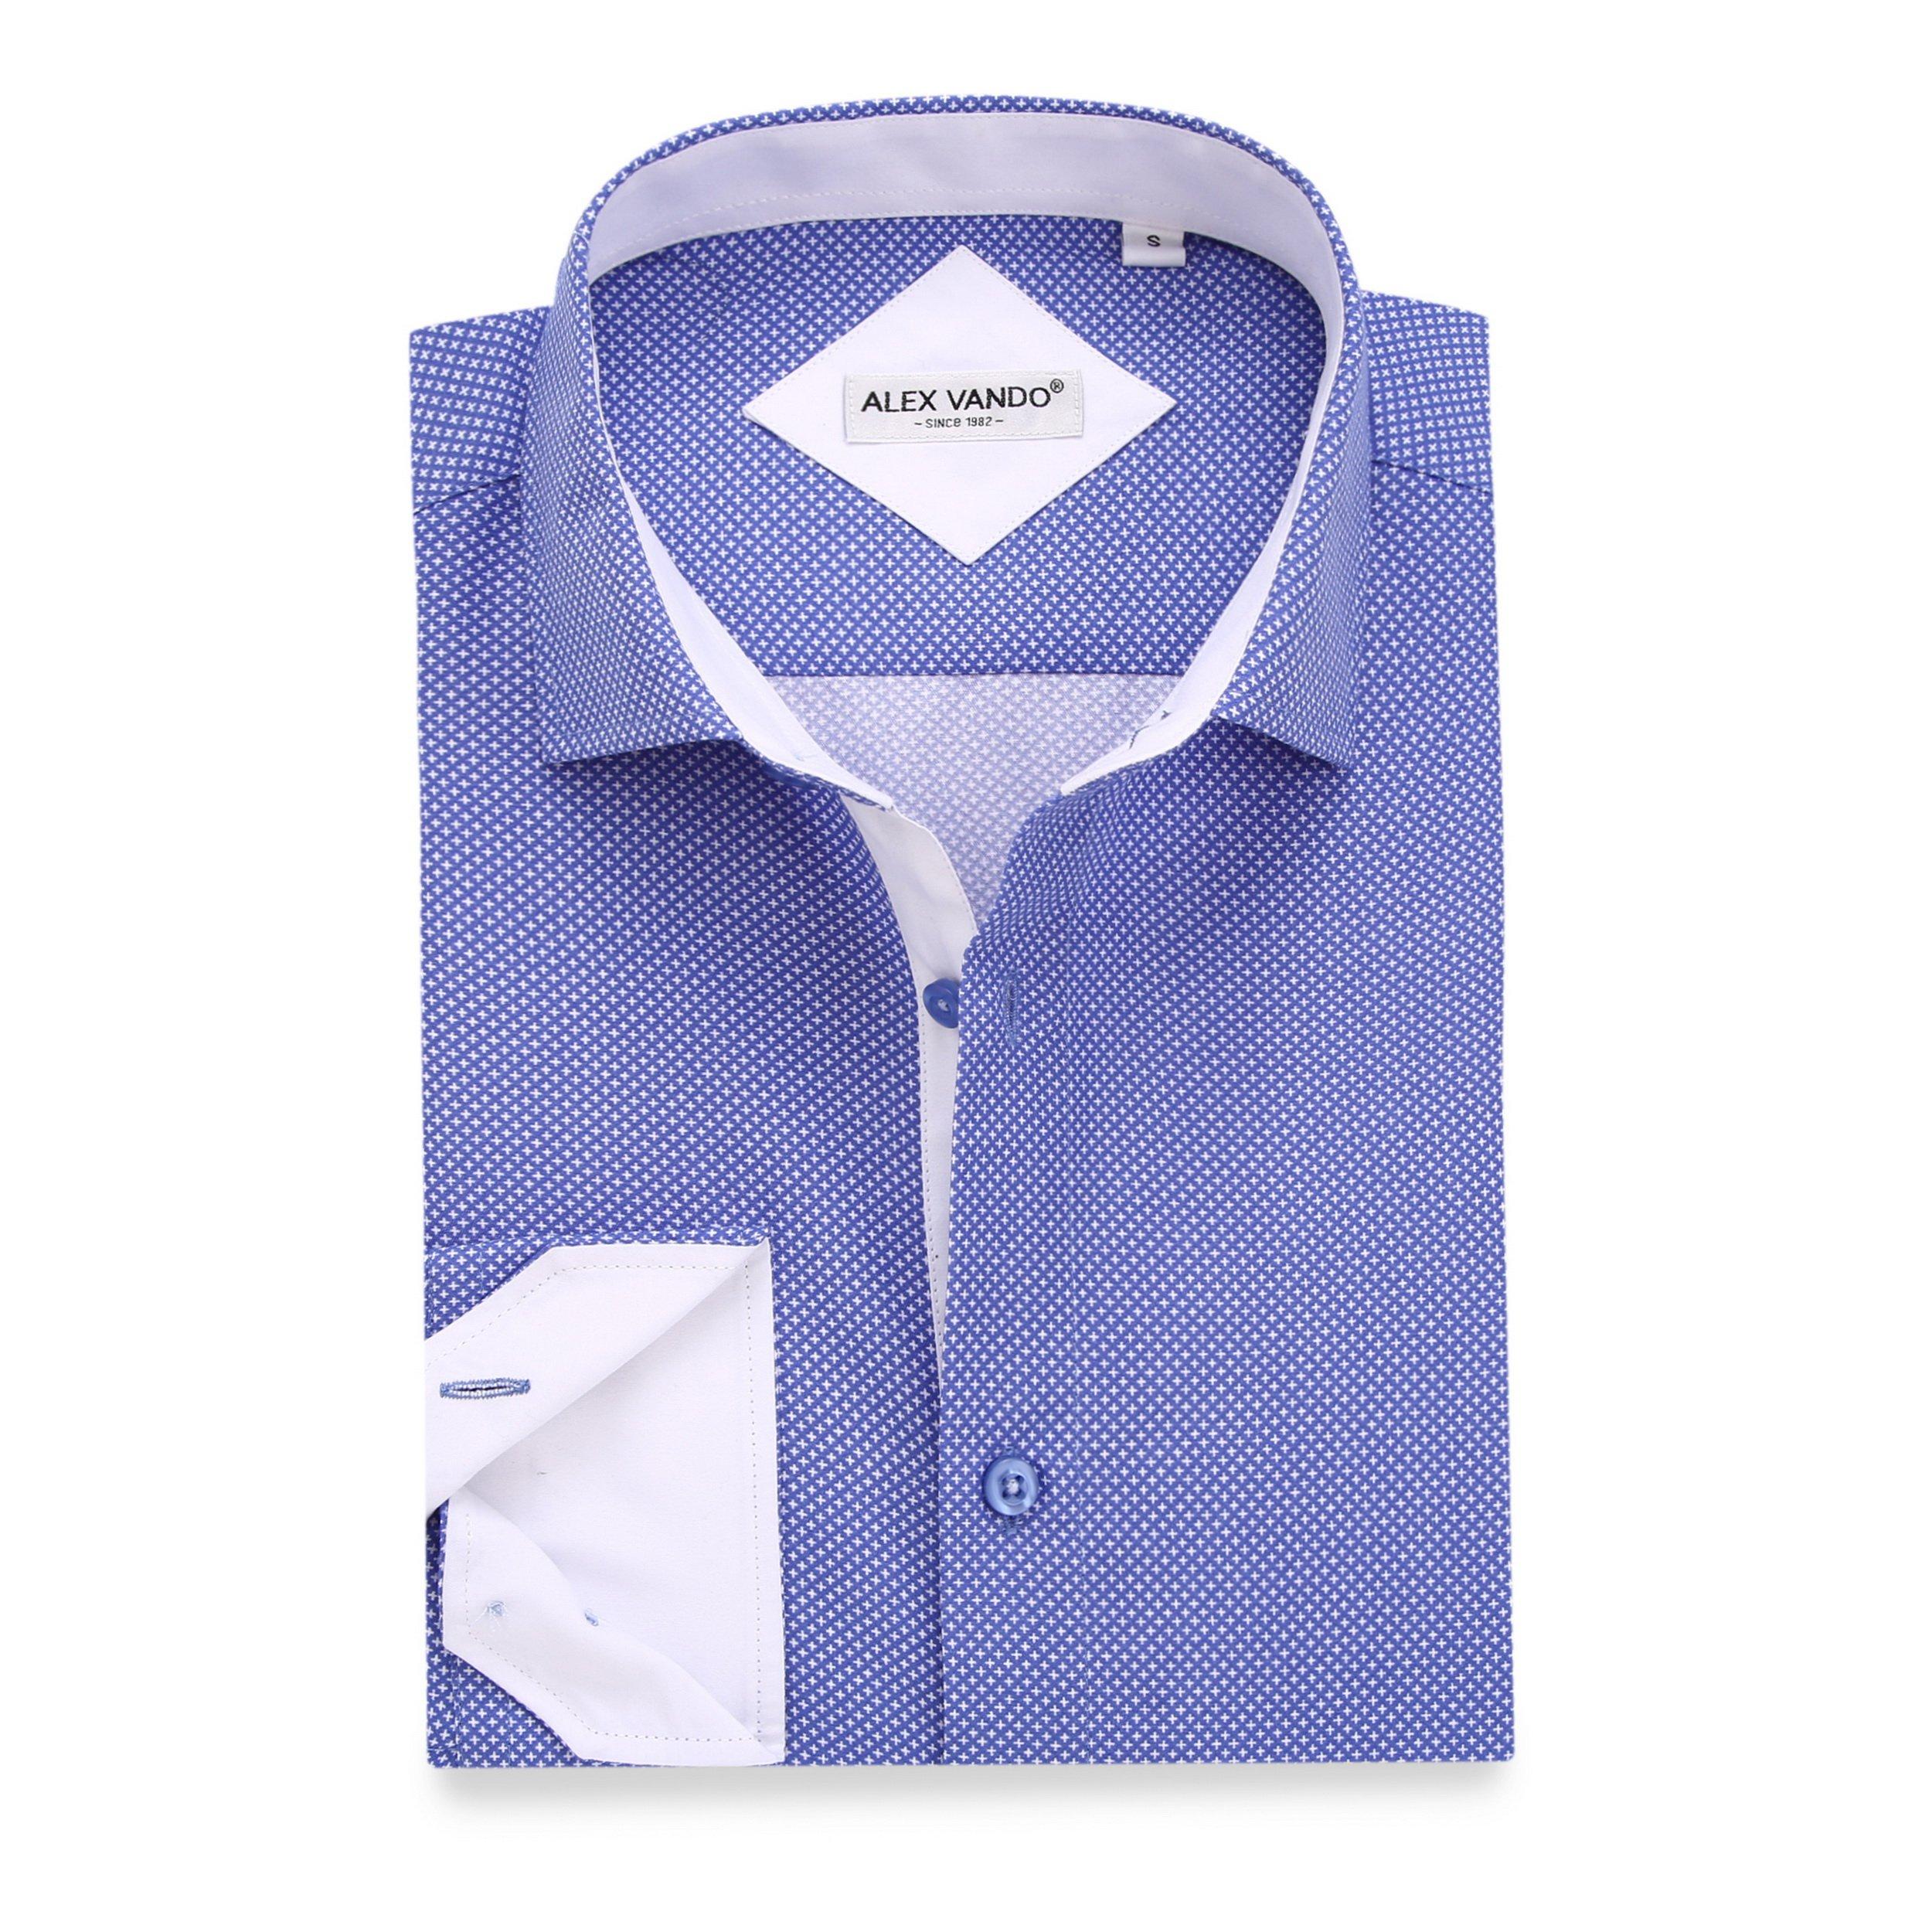 Alex Vando Mens Casual Button Down Shirts Long Sleeve Print Men Shirt(Blue,X Large)